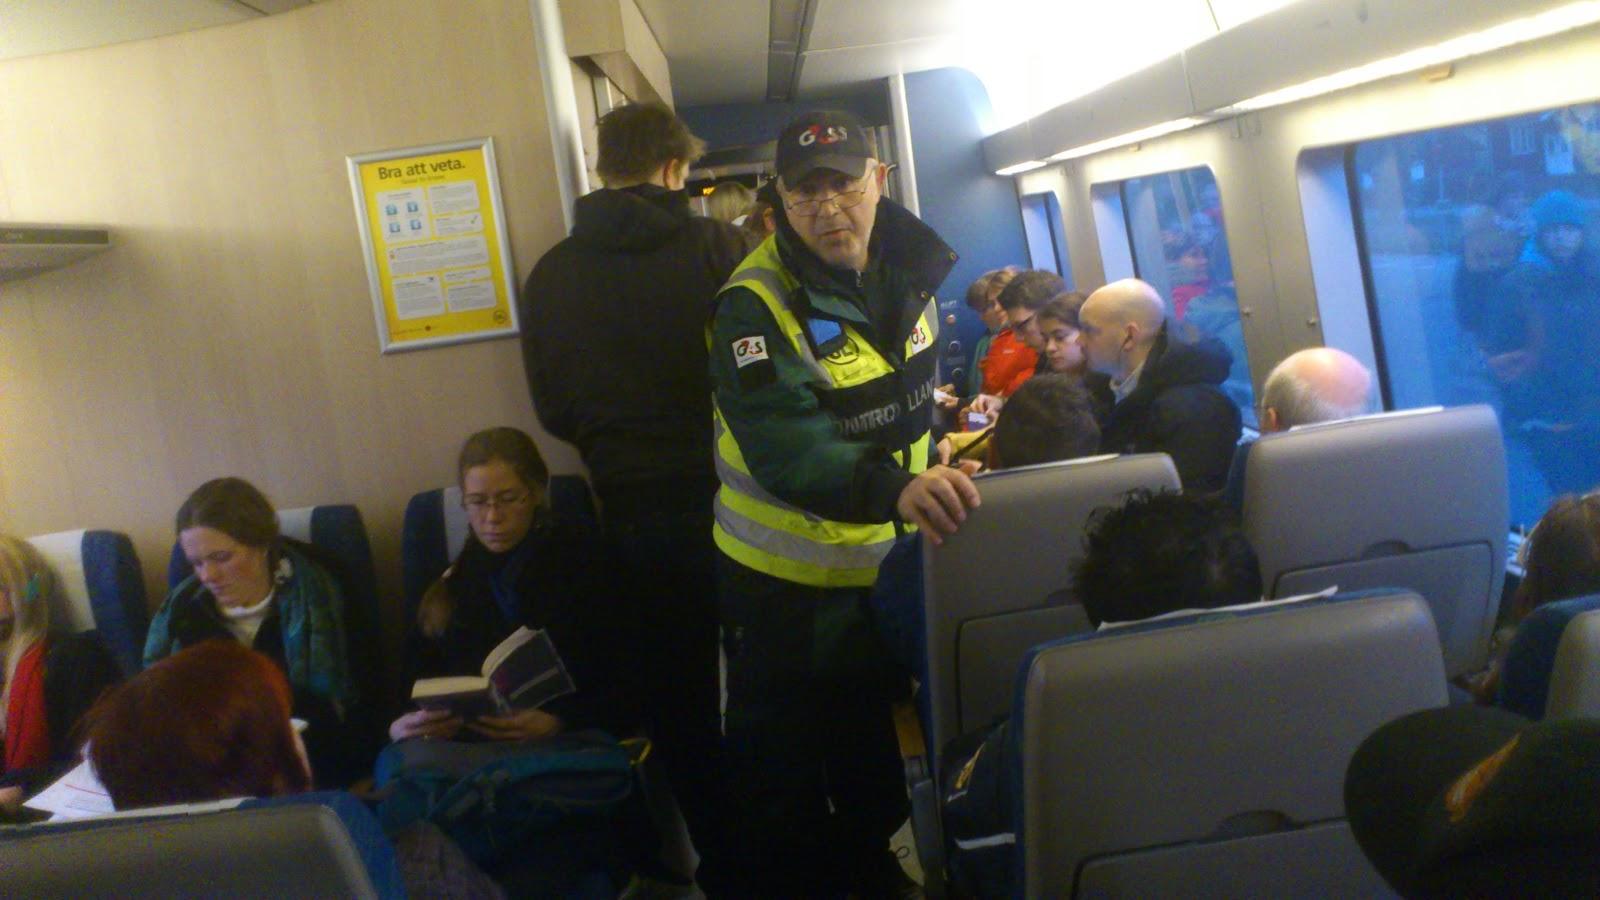 sl sms biljett uppsala stockholm